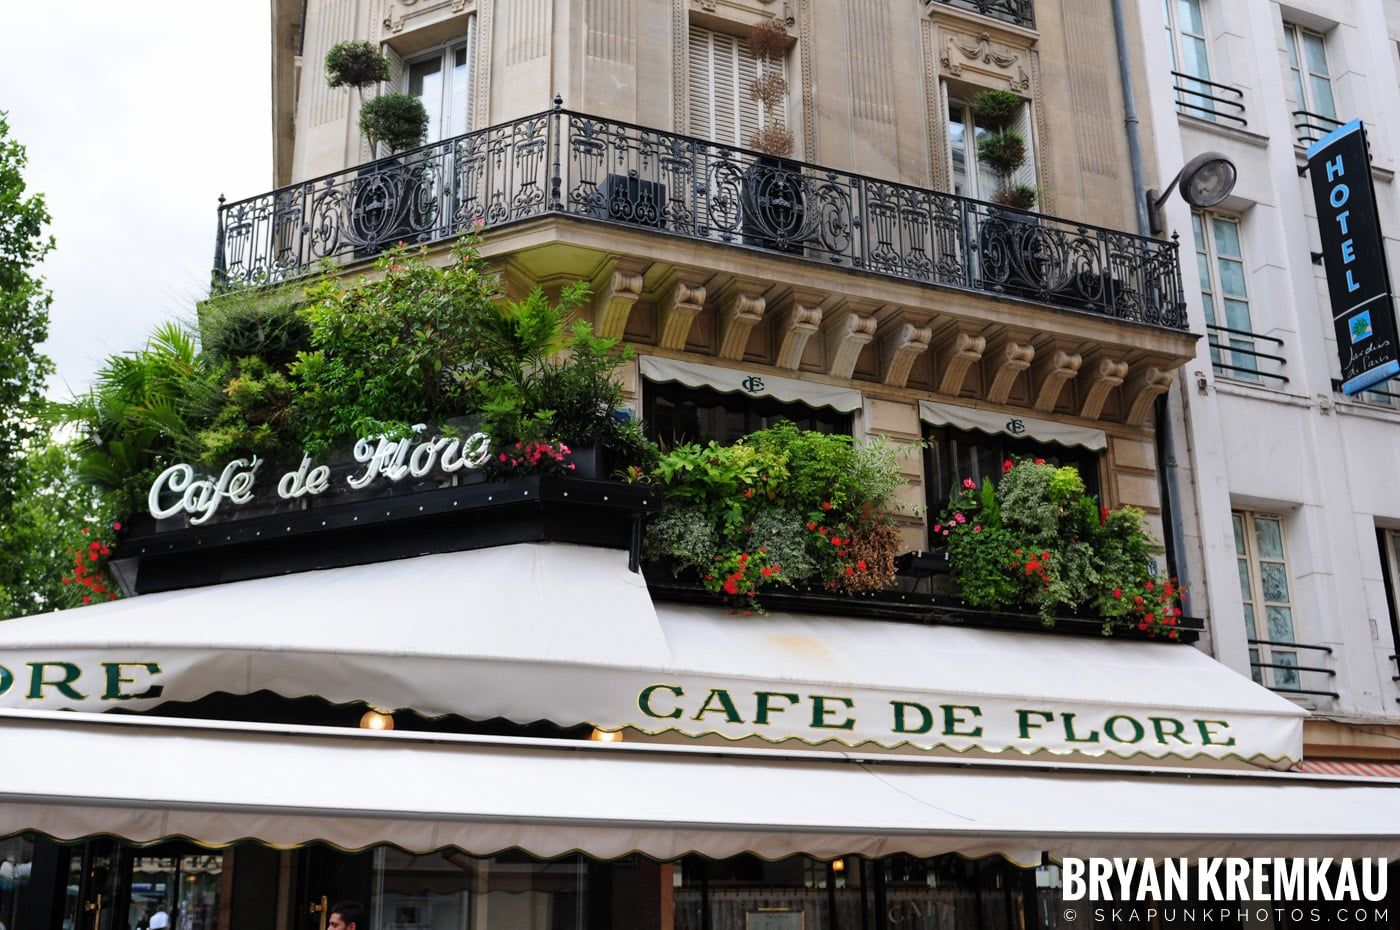 Paris, France Honeymoon - Day 1 - 7.18.11 (13)